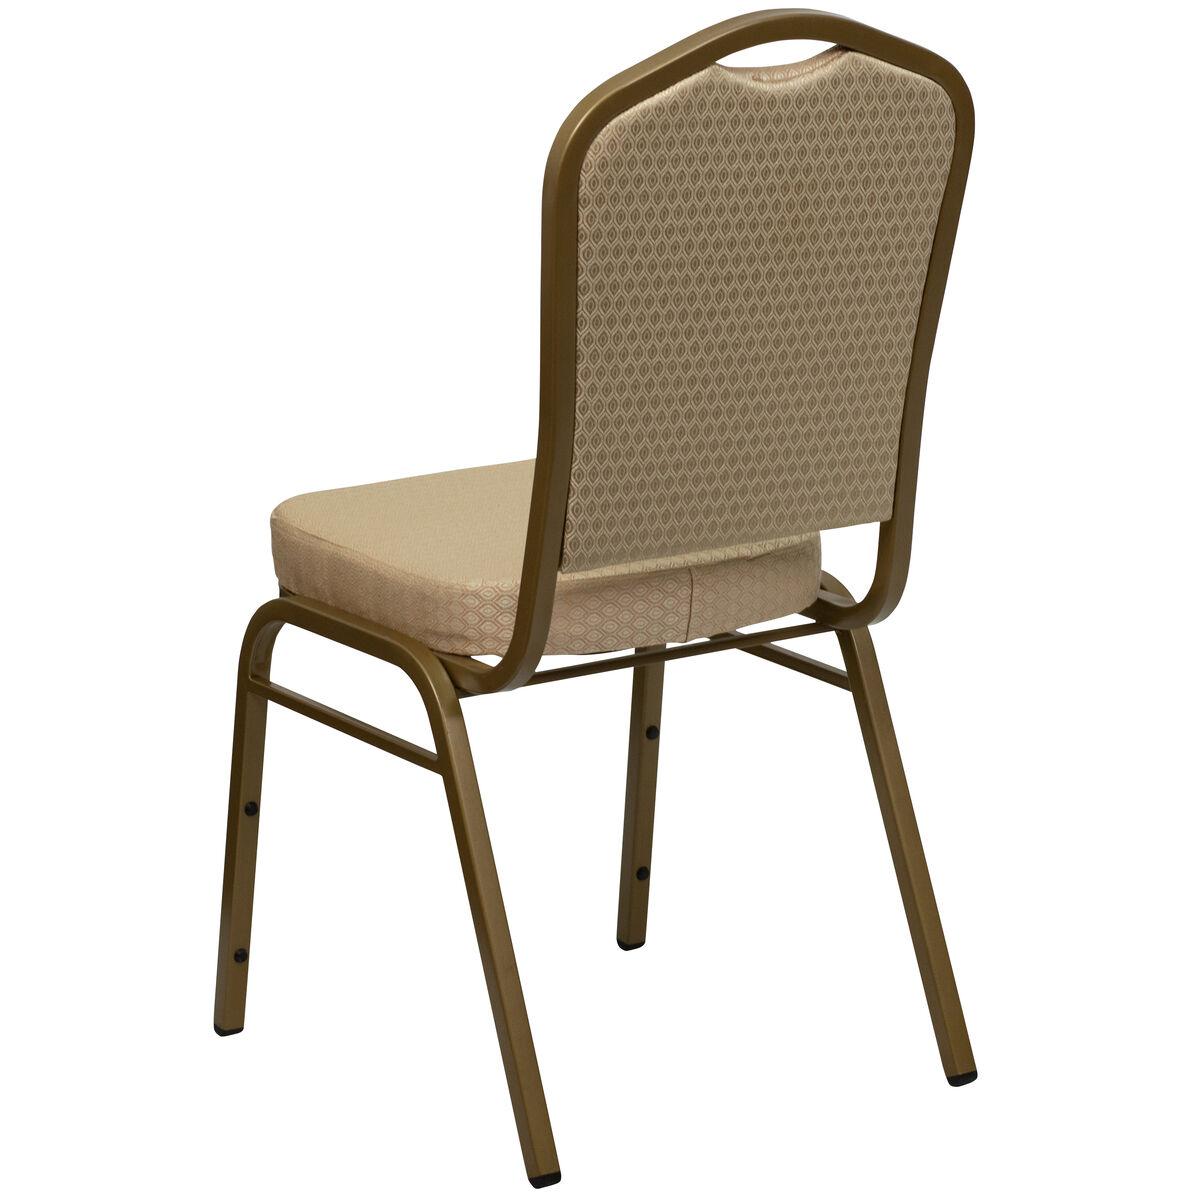 Flash furniture fd c01 allgold h20124e gg for H furniture ww chair